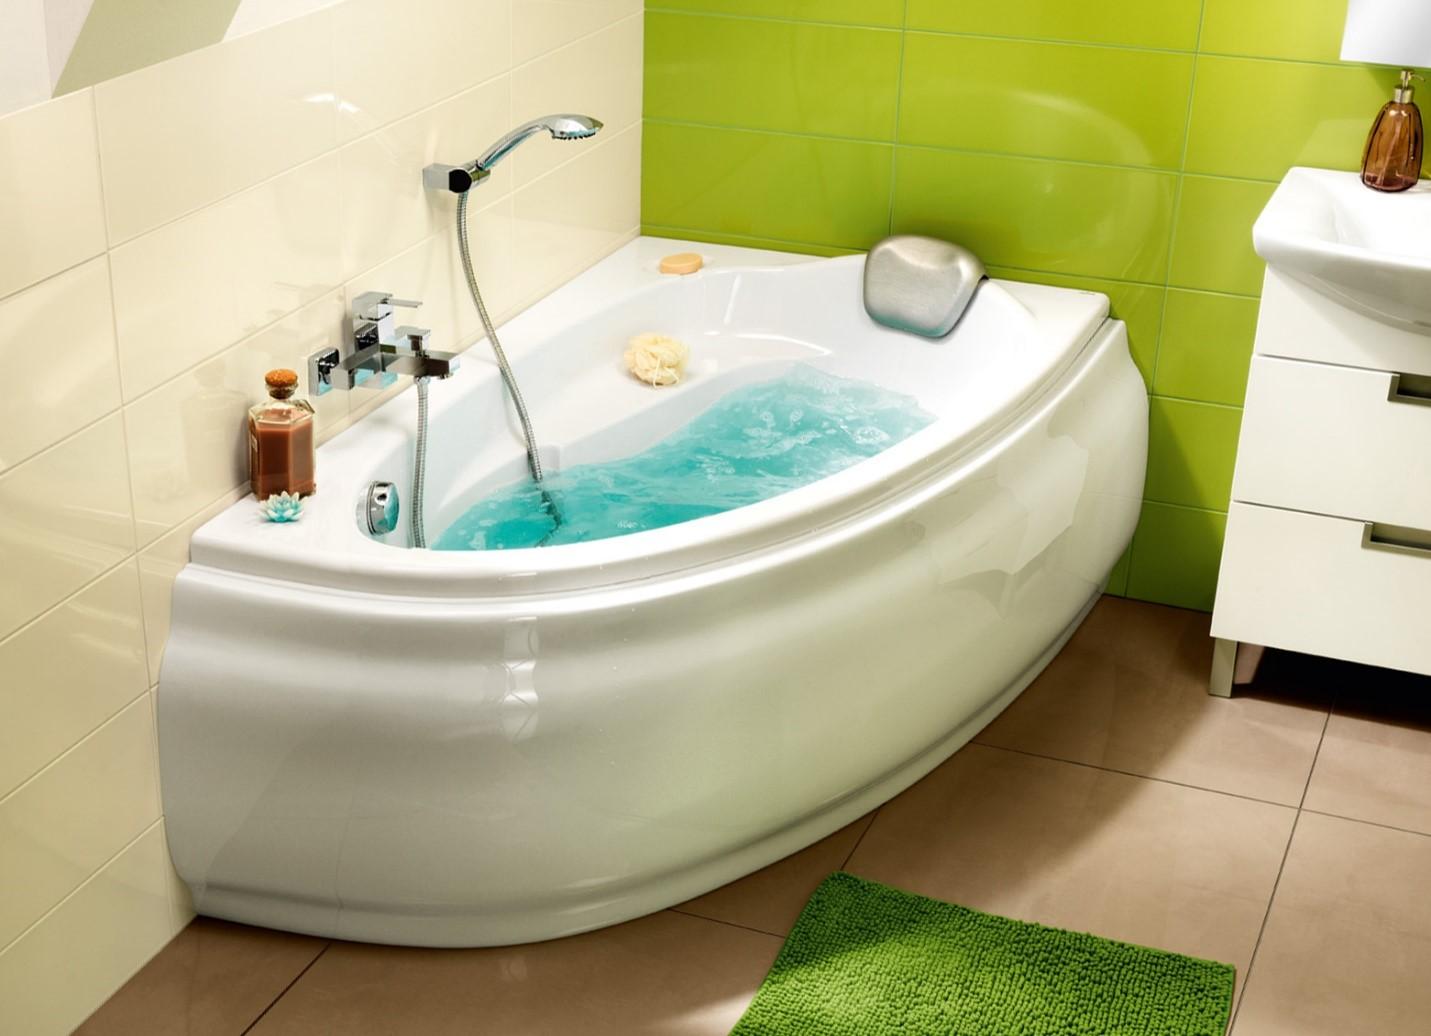 Правильные формы ванны